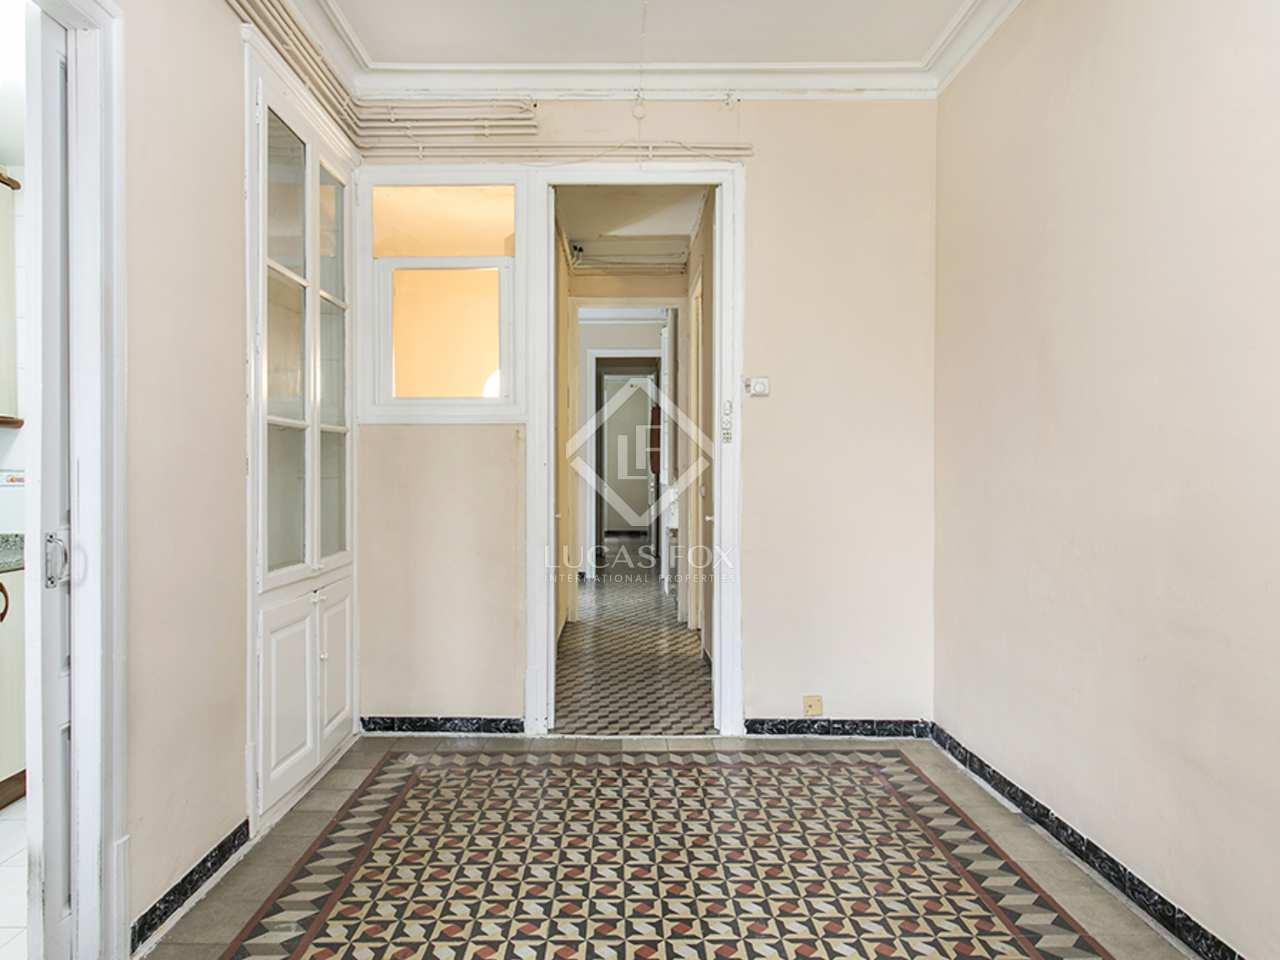 Appartement de 71m a vendre gr cia barcelone - Acheter appartement a barcelone ...